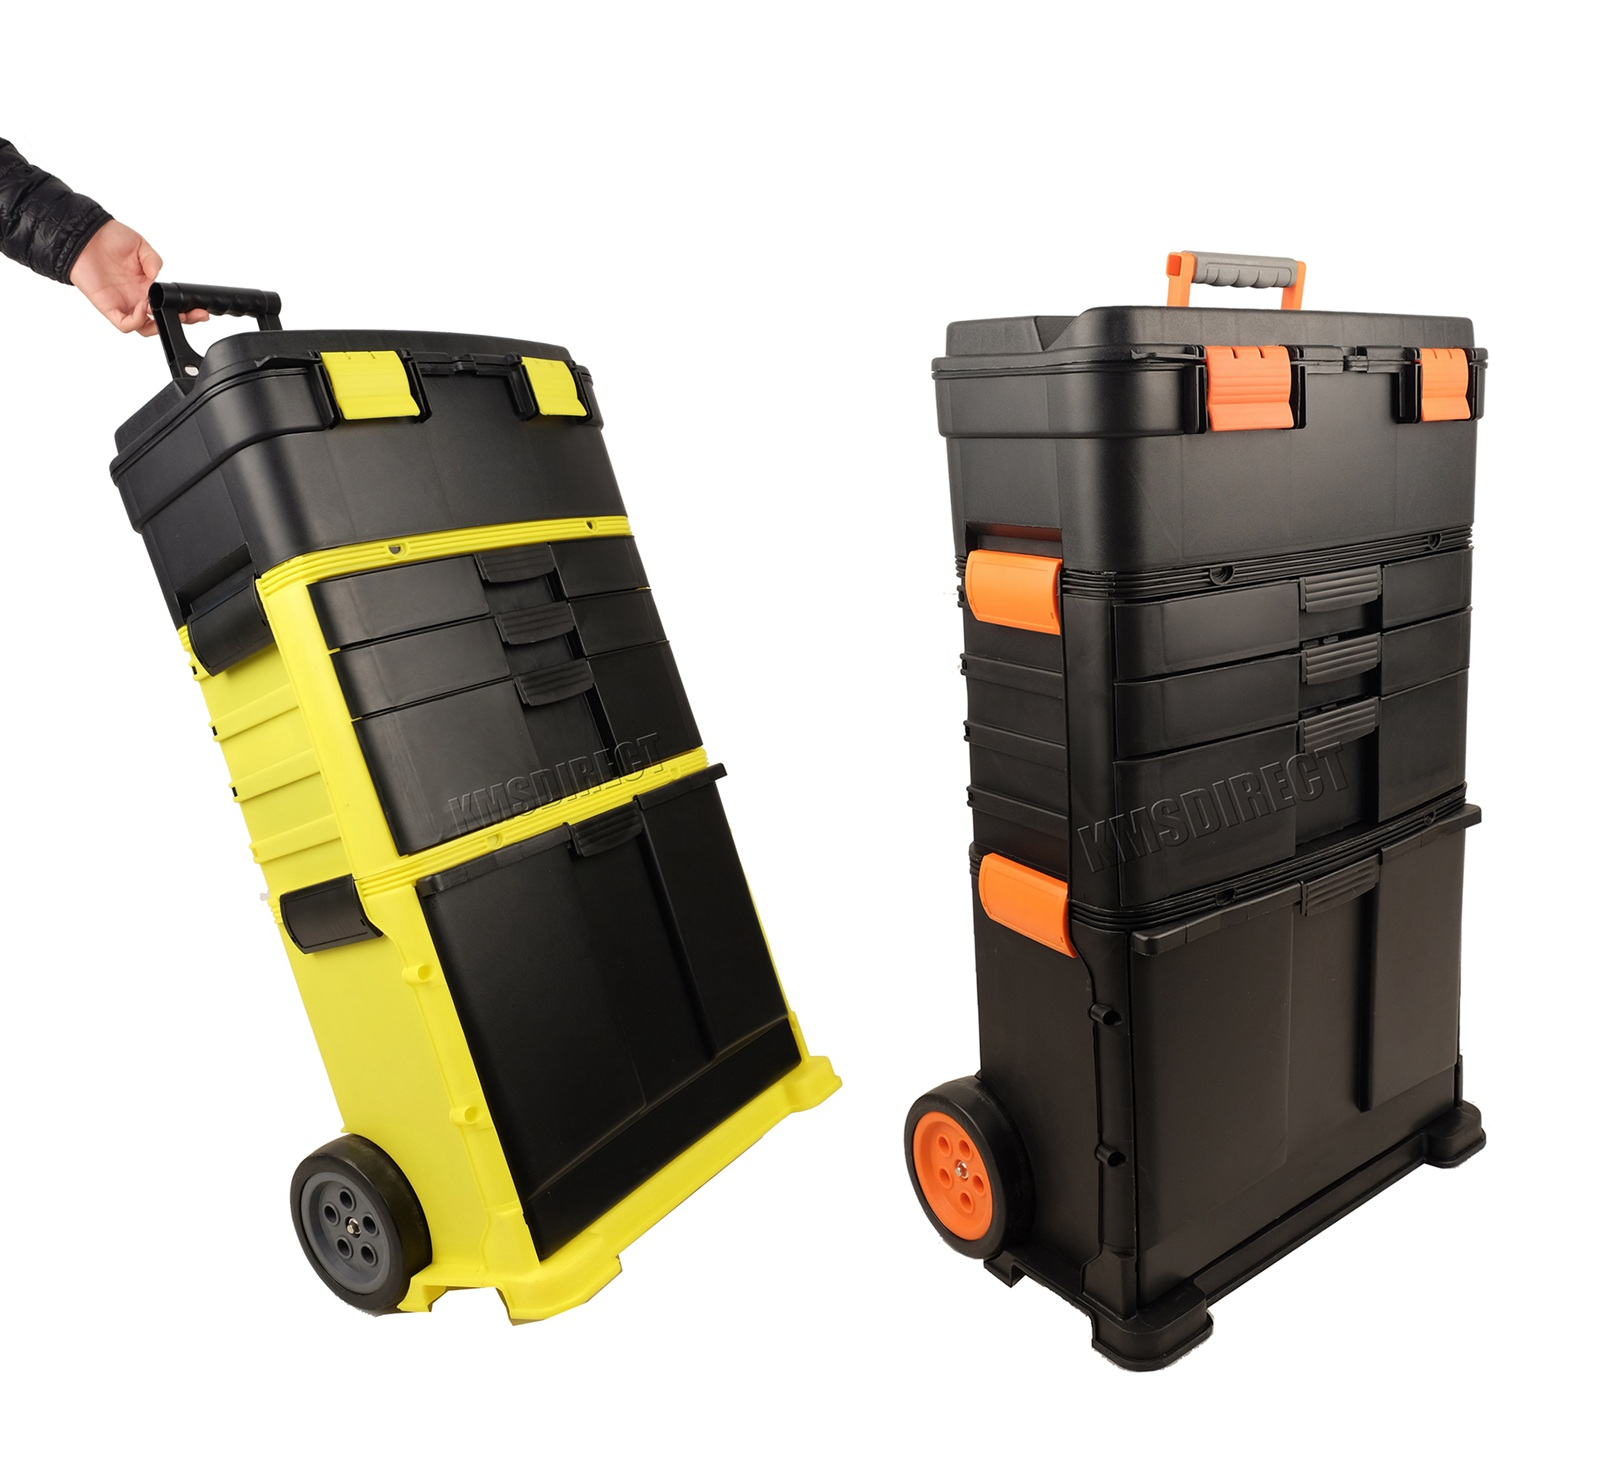 westwood plastic mobile roller work shop chest trolley storage tool box toolbox ebay. Black Bedroom Furniture Sets. Home Design Ideas